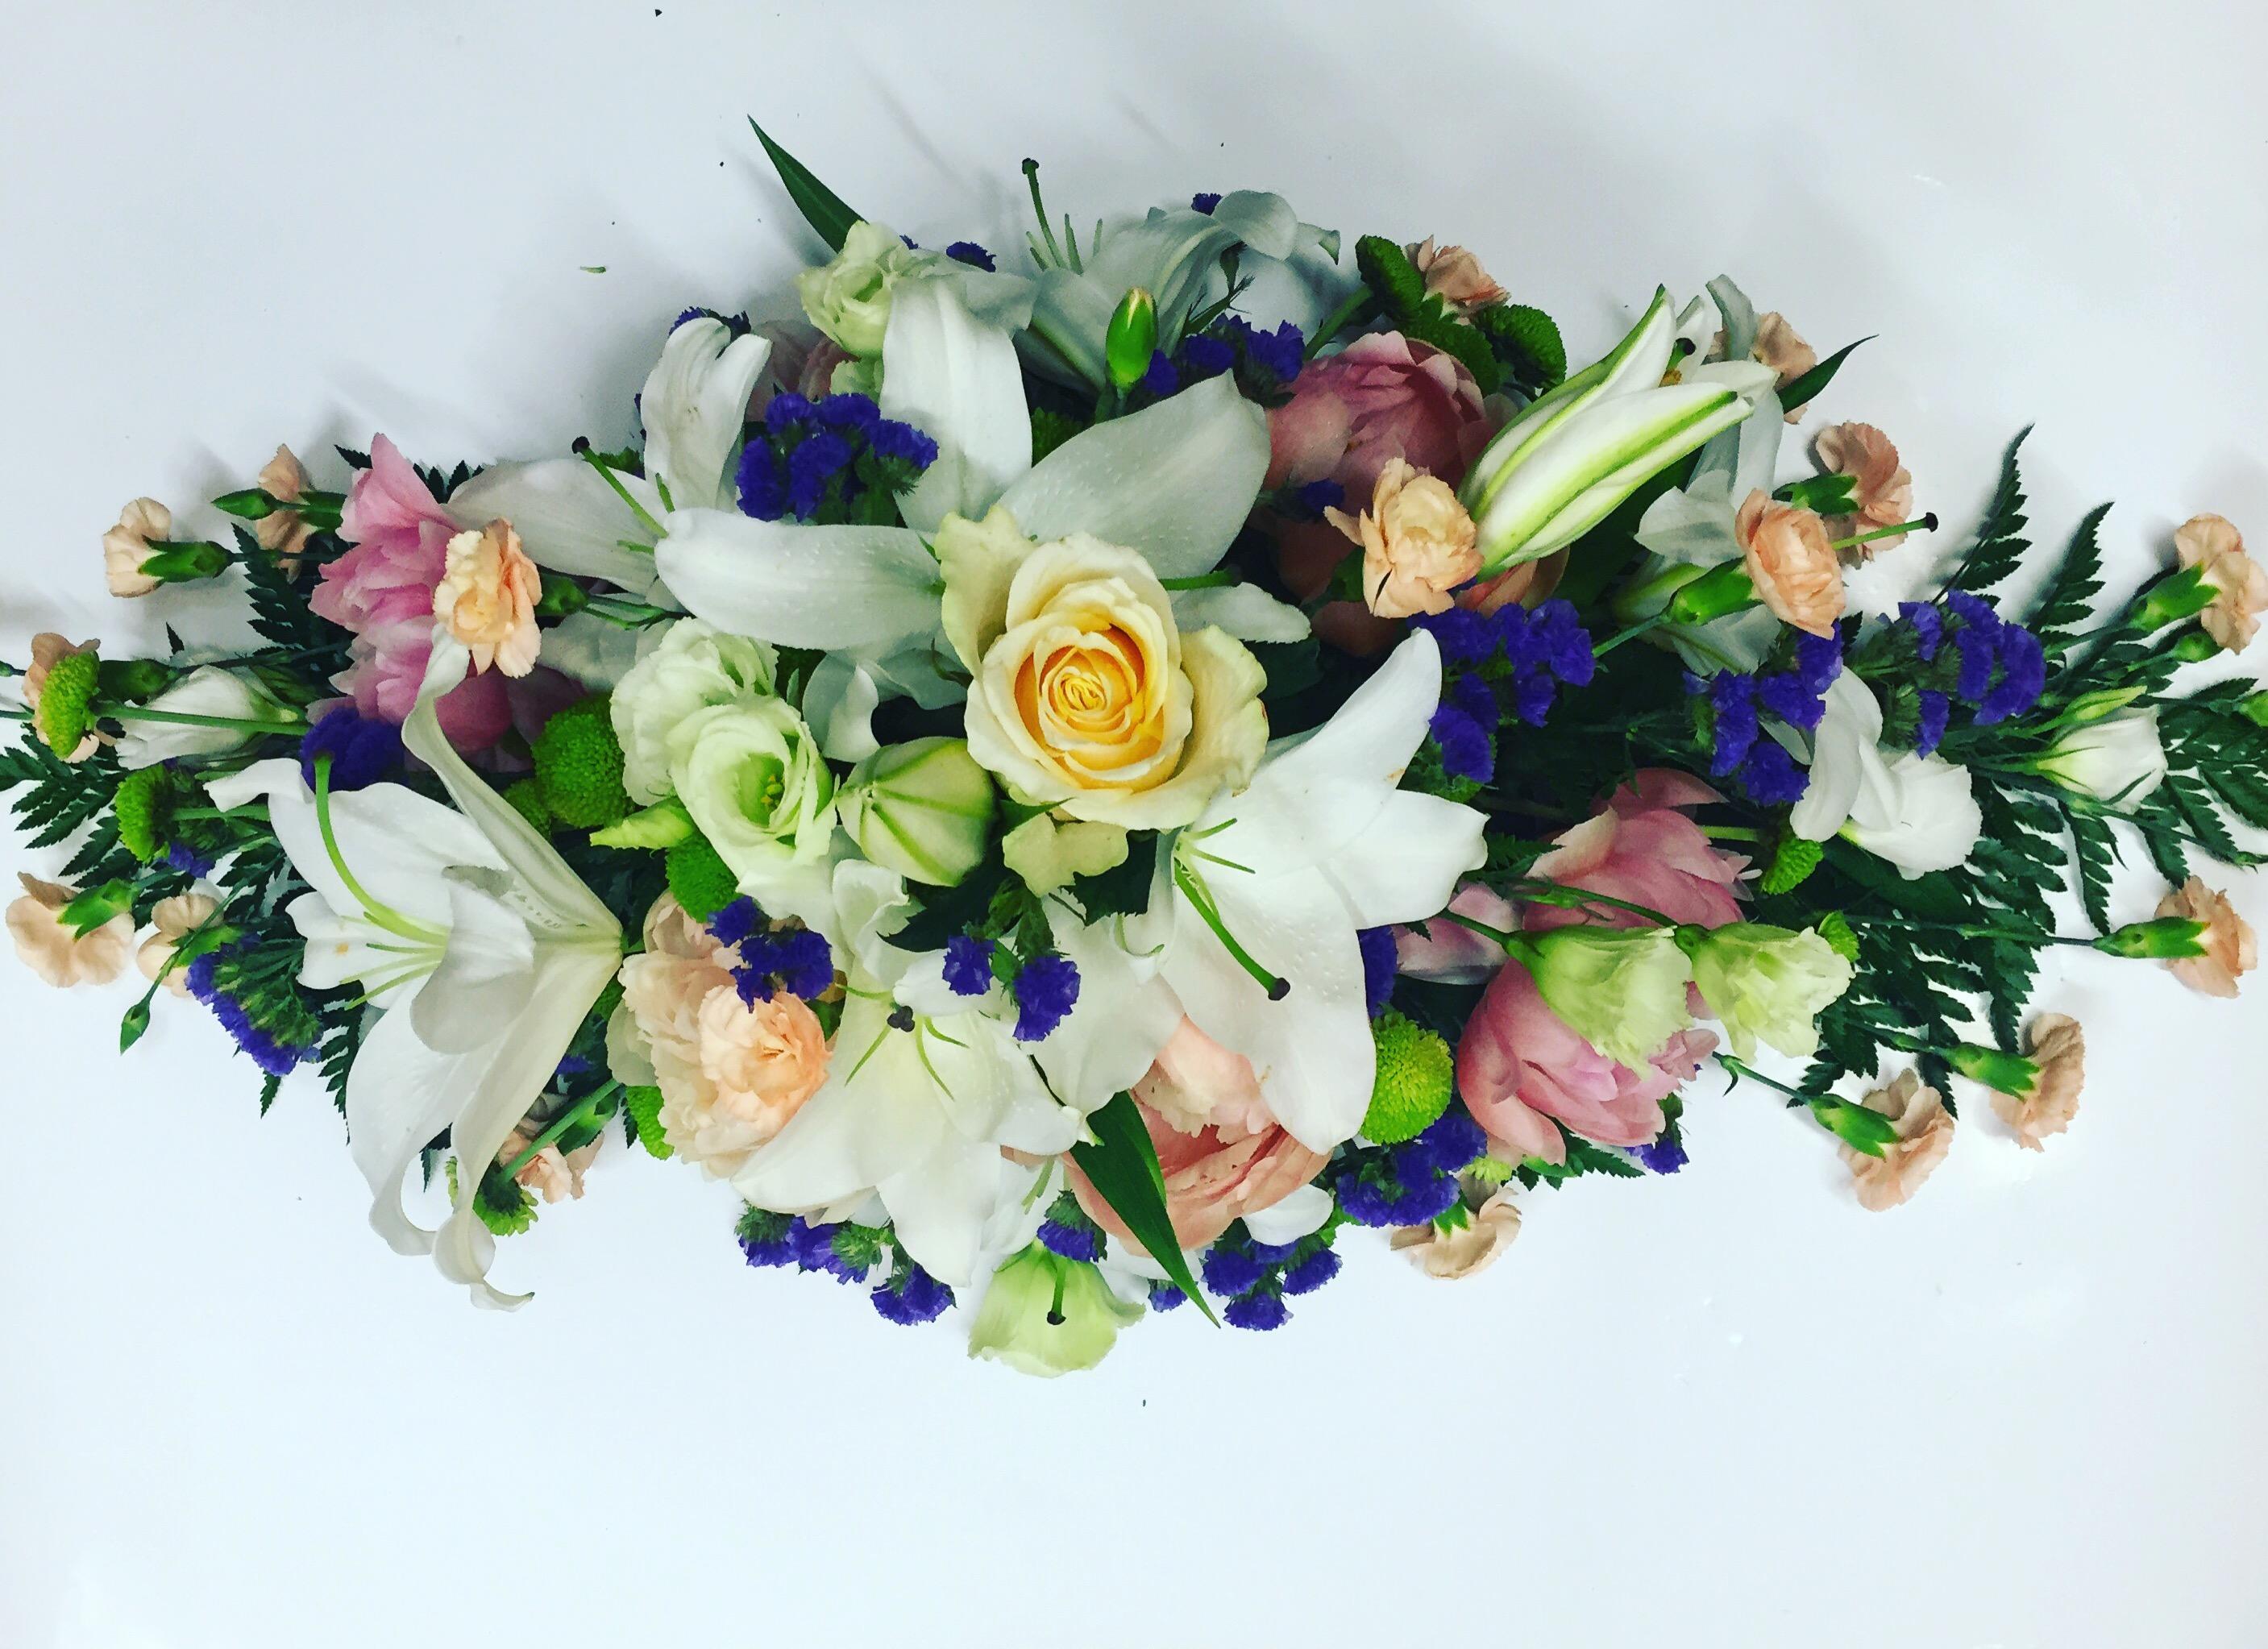 Funeral Eileens